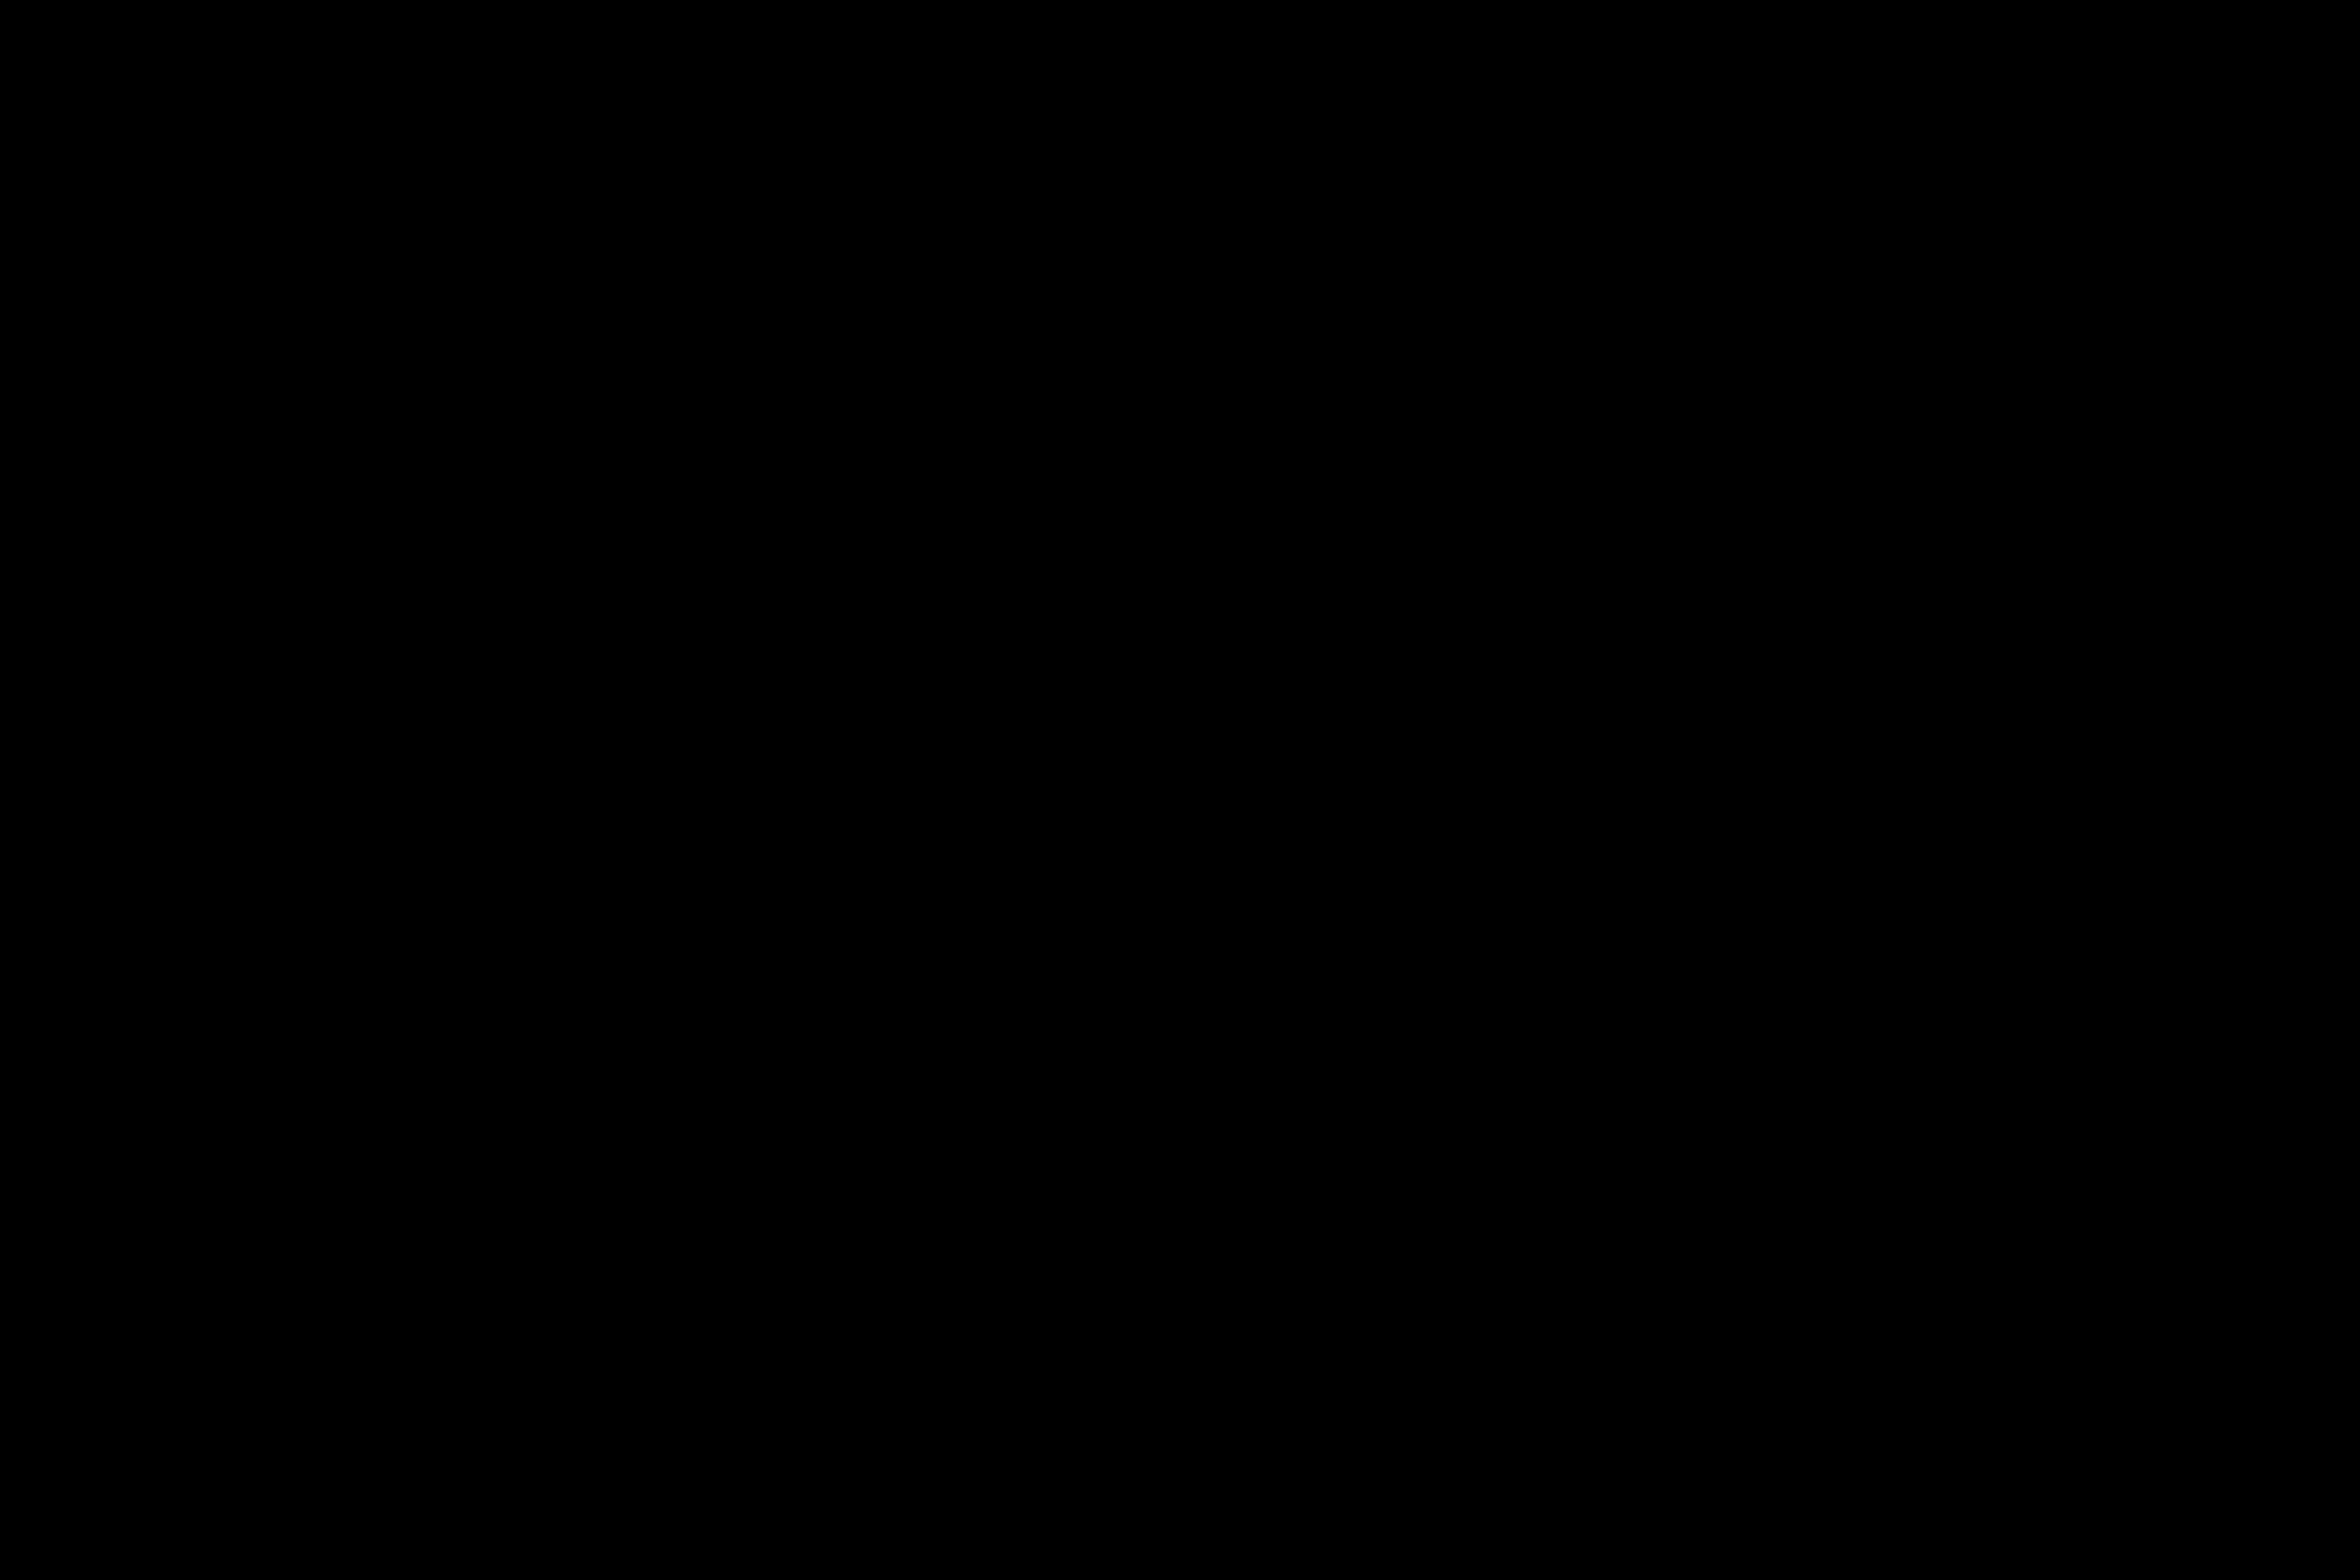 dehesa-837227